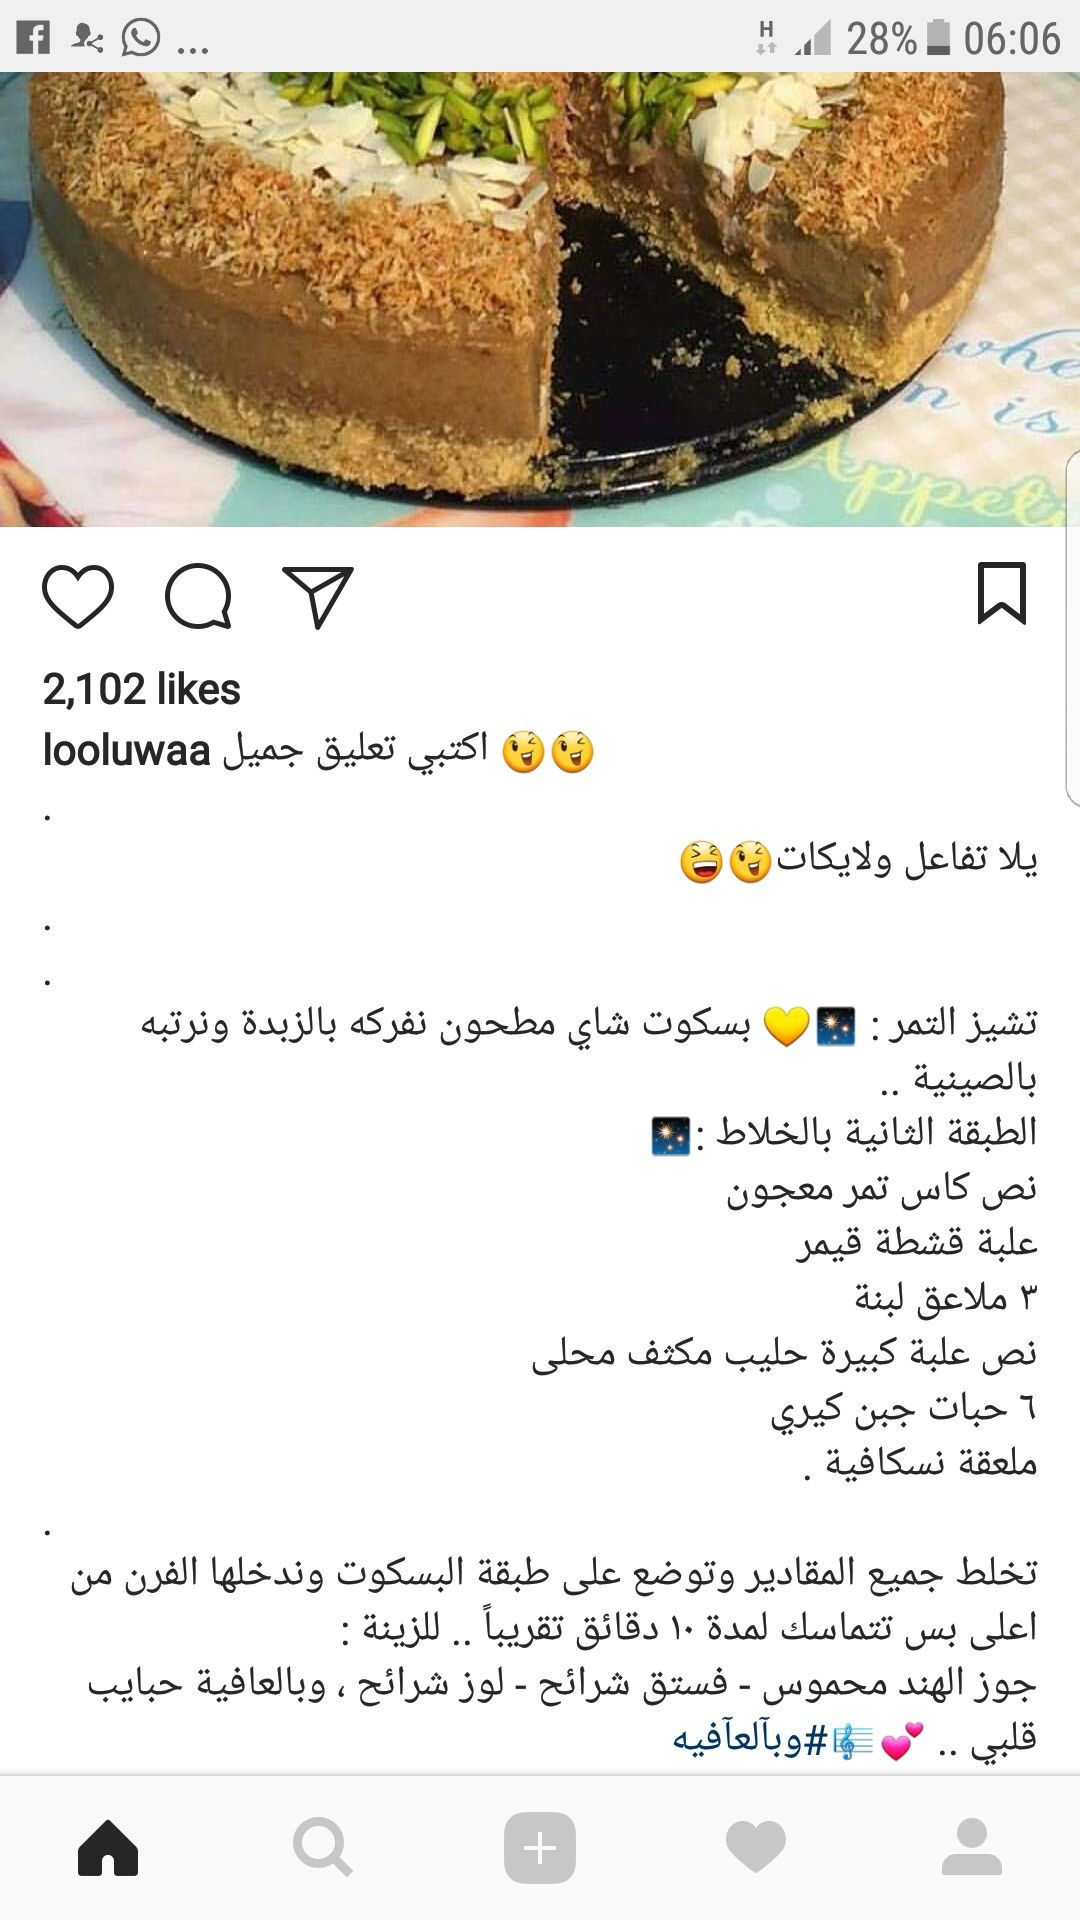 تشيز كيك التمر Food Pictures Cooking Arabic Food